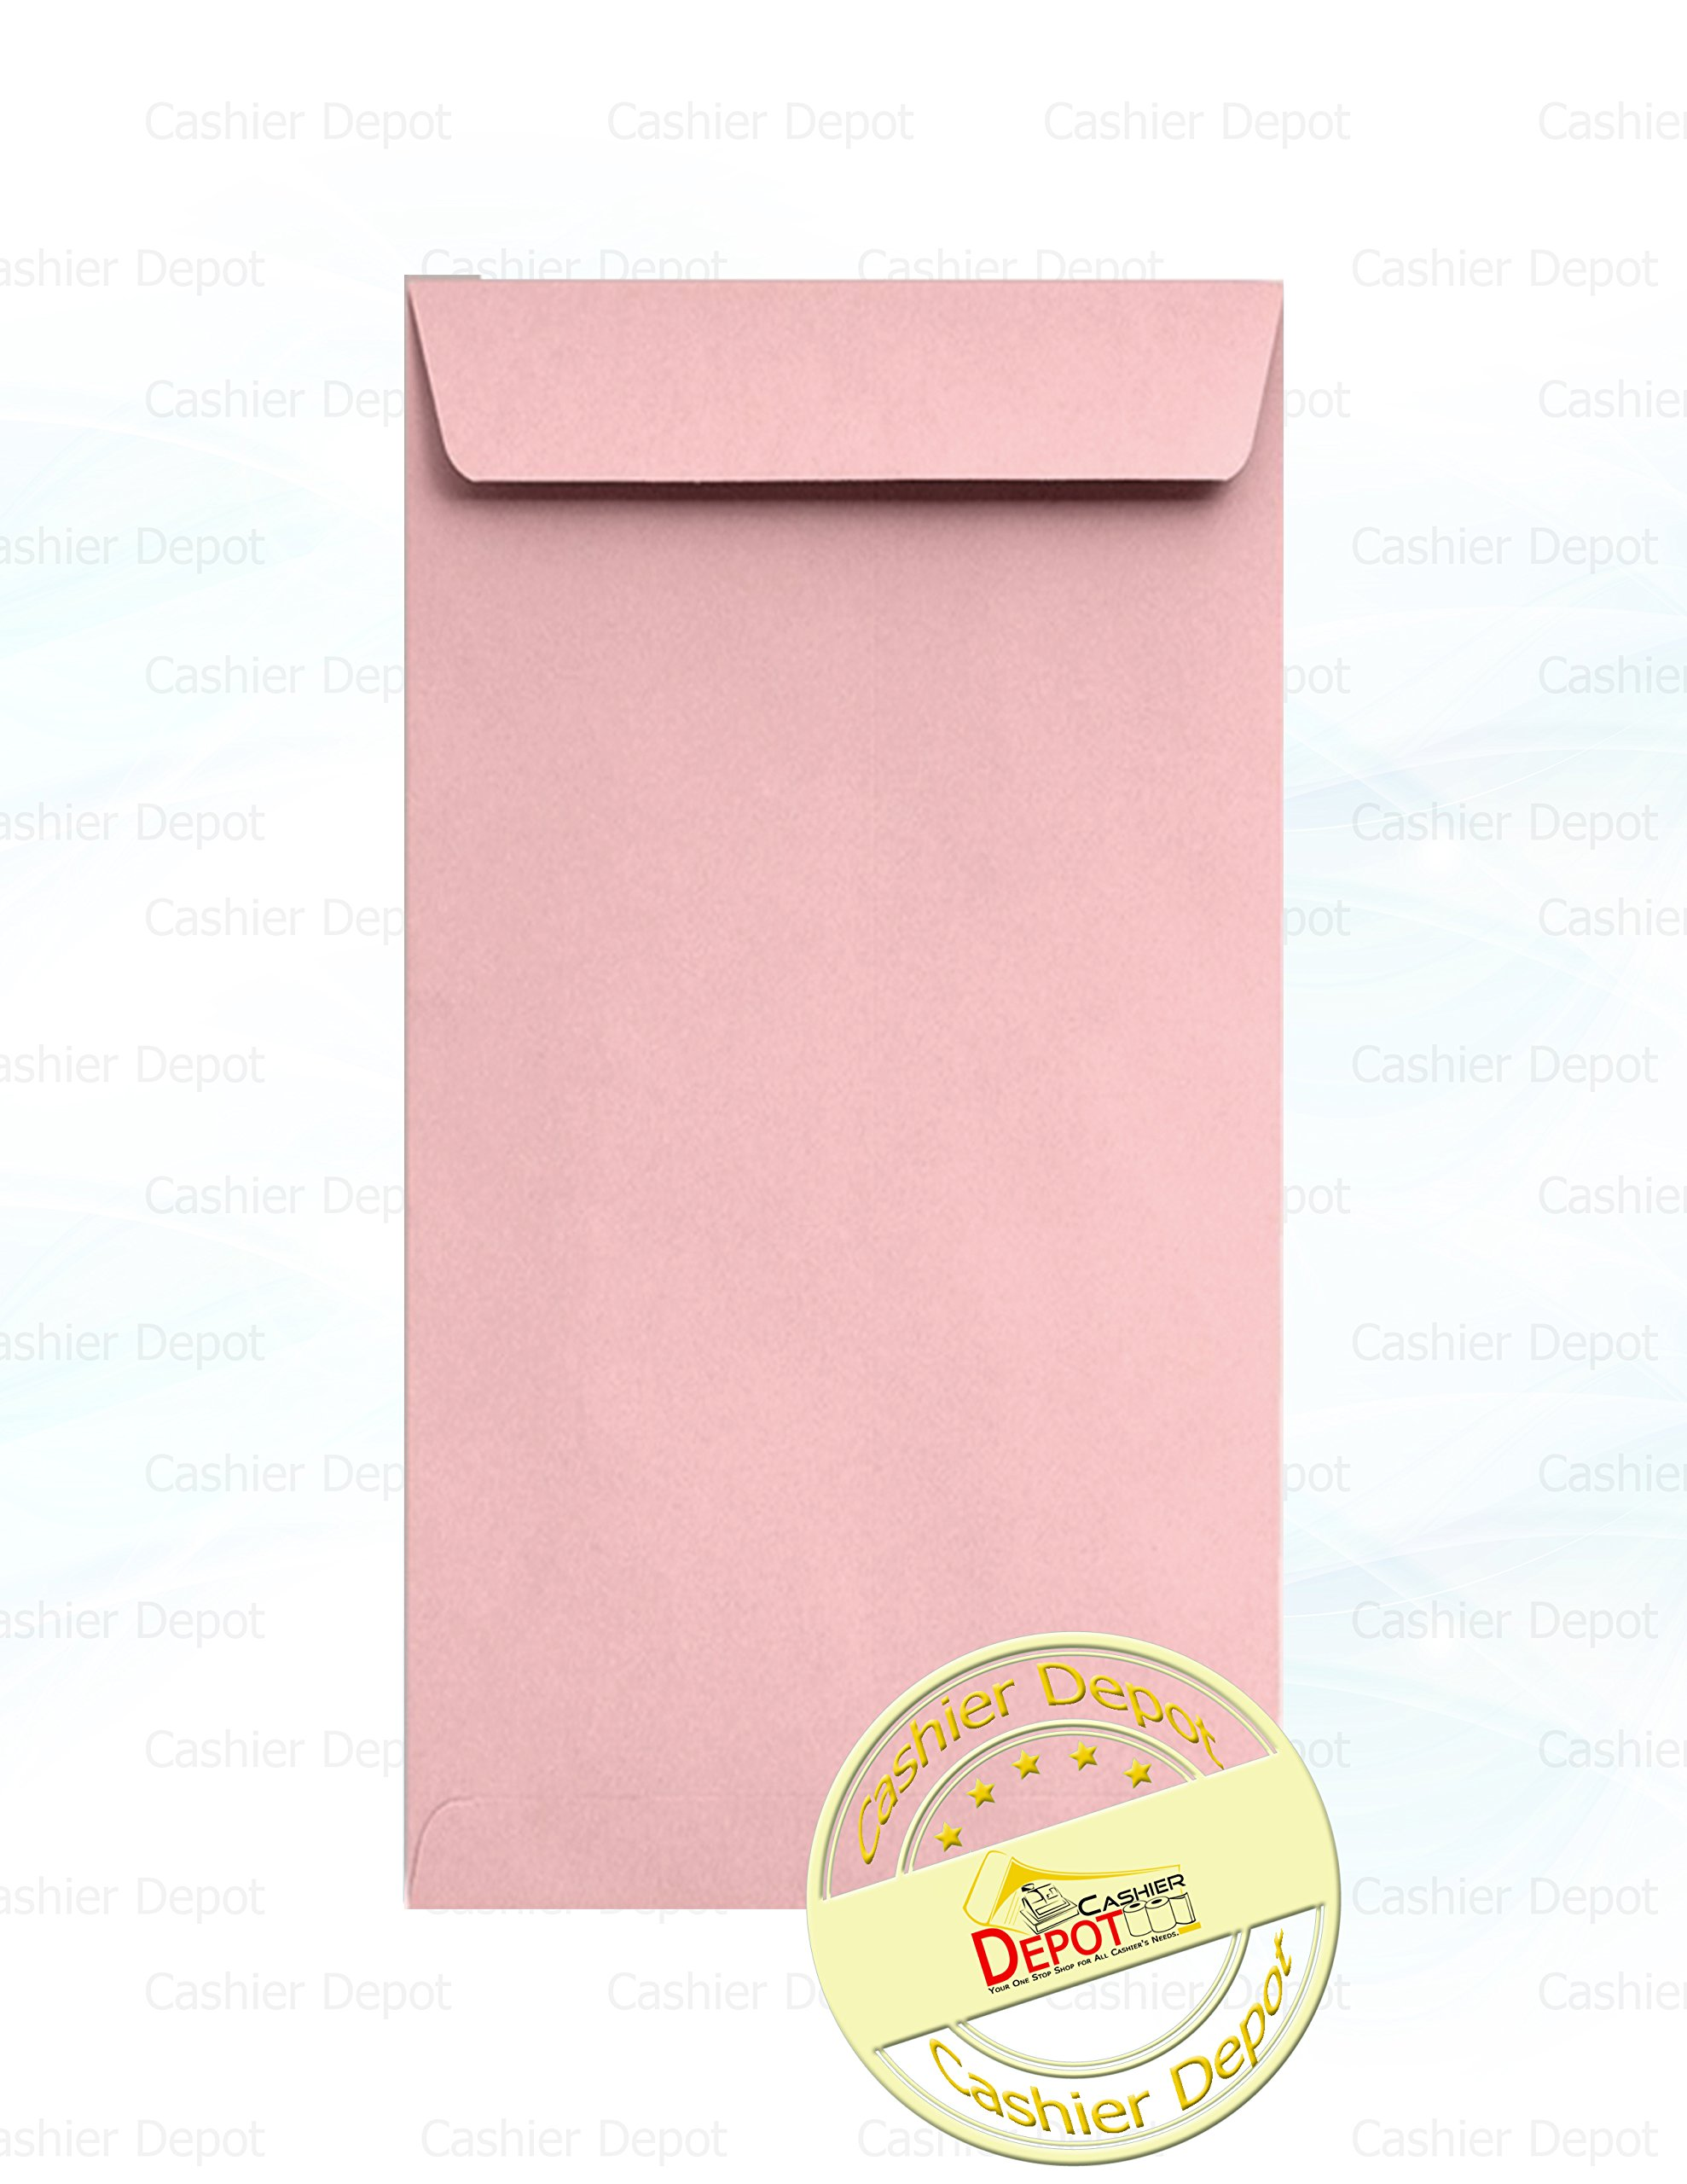 Coin / Cash / Small Parts #7 Envelopes, 3-1/2'' X 6-1/2'', 24lb, 250/Box (Pink)